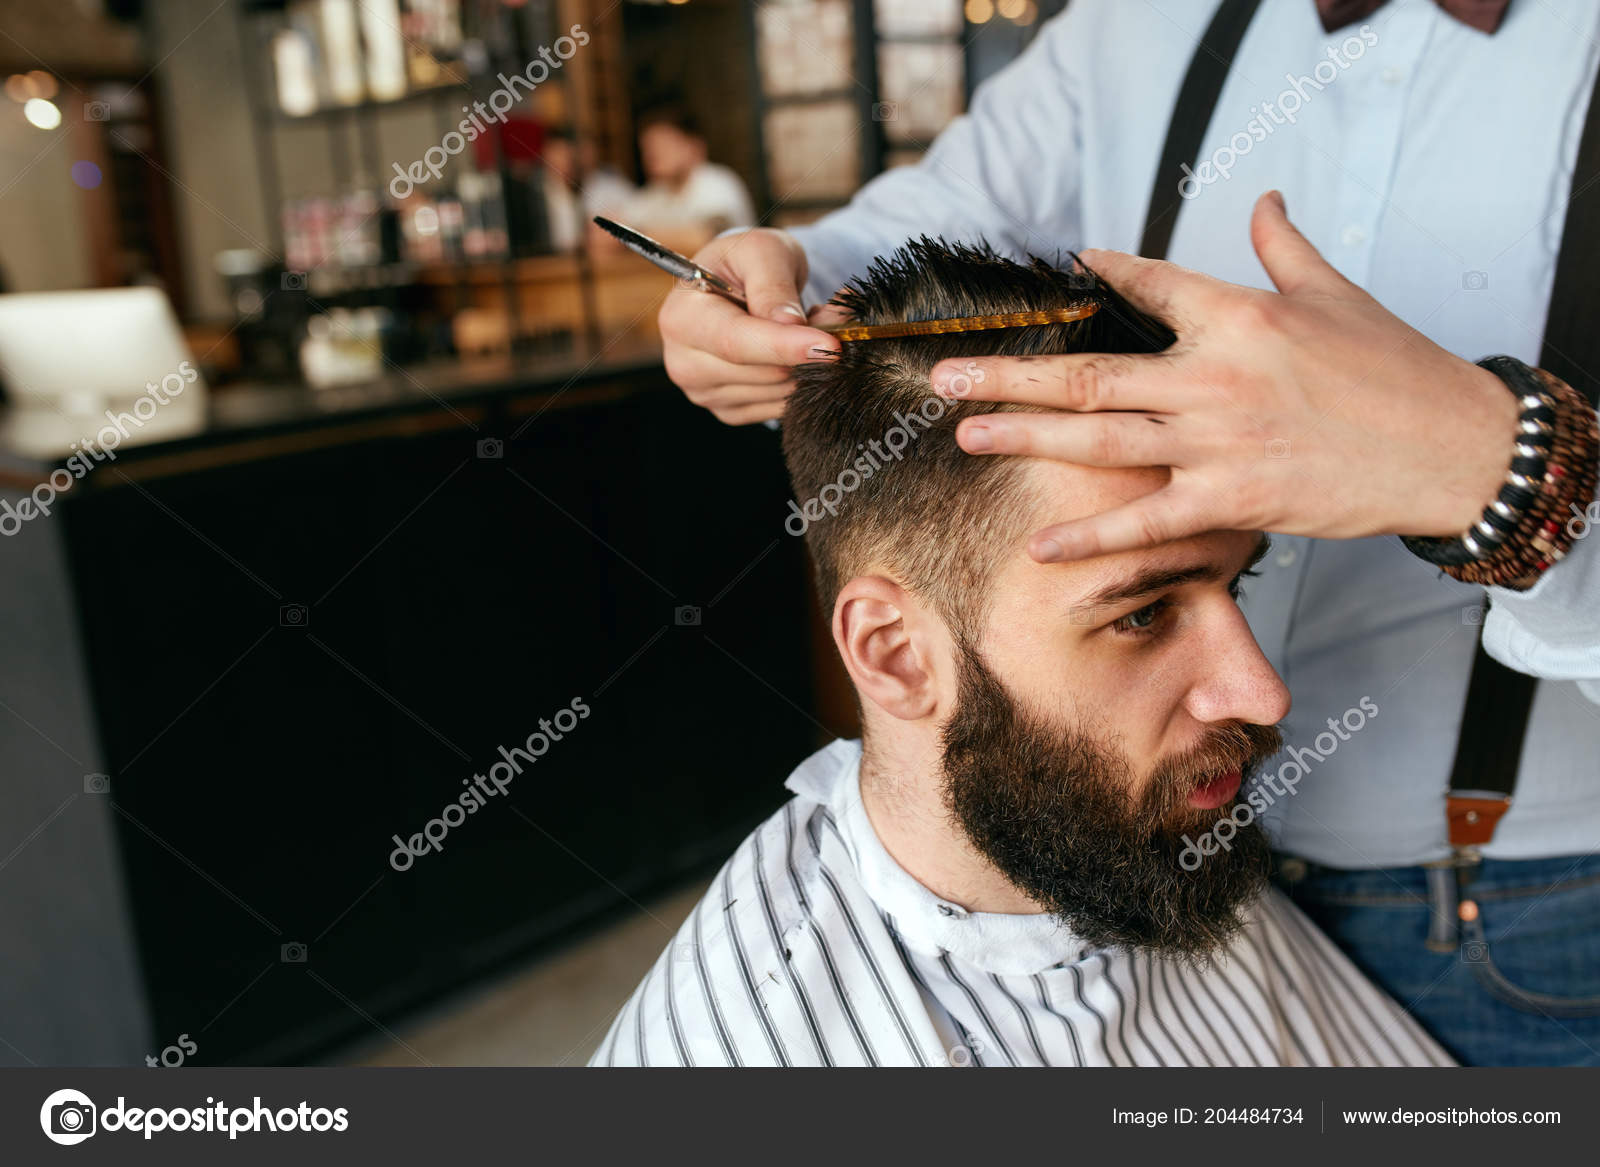 Men Haircut Barber Cutting Man Hair Barber Shop Male Hairdresser